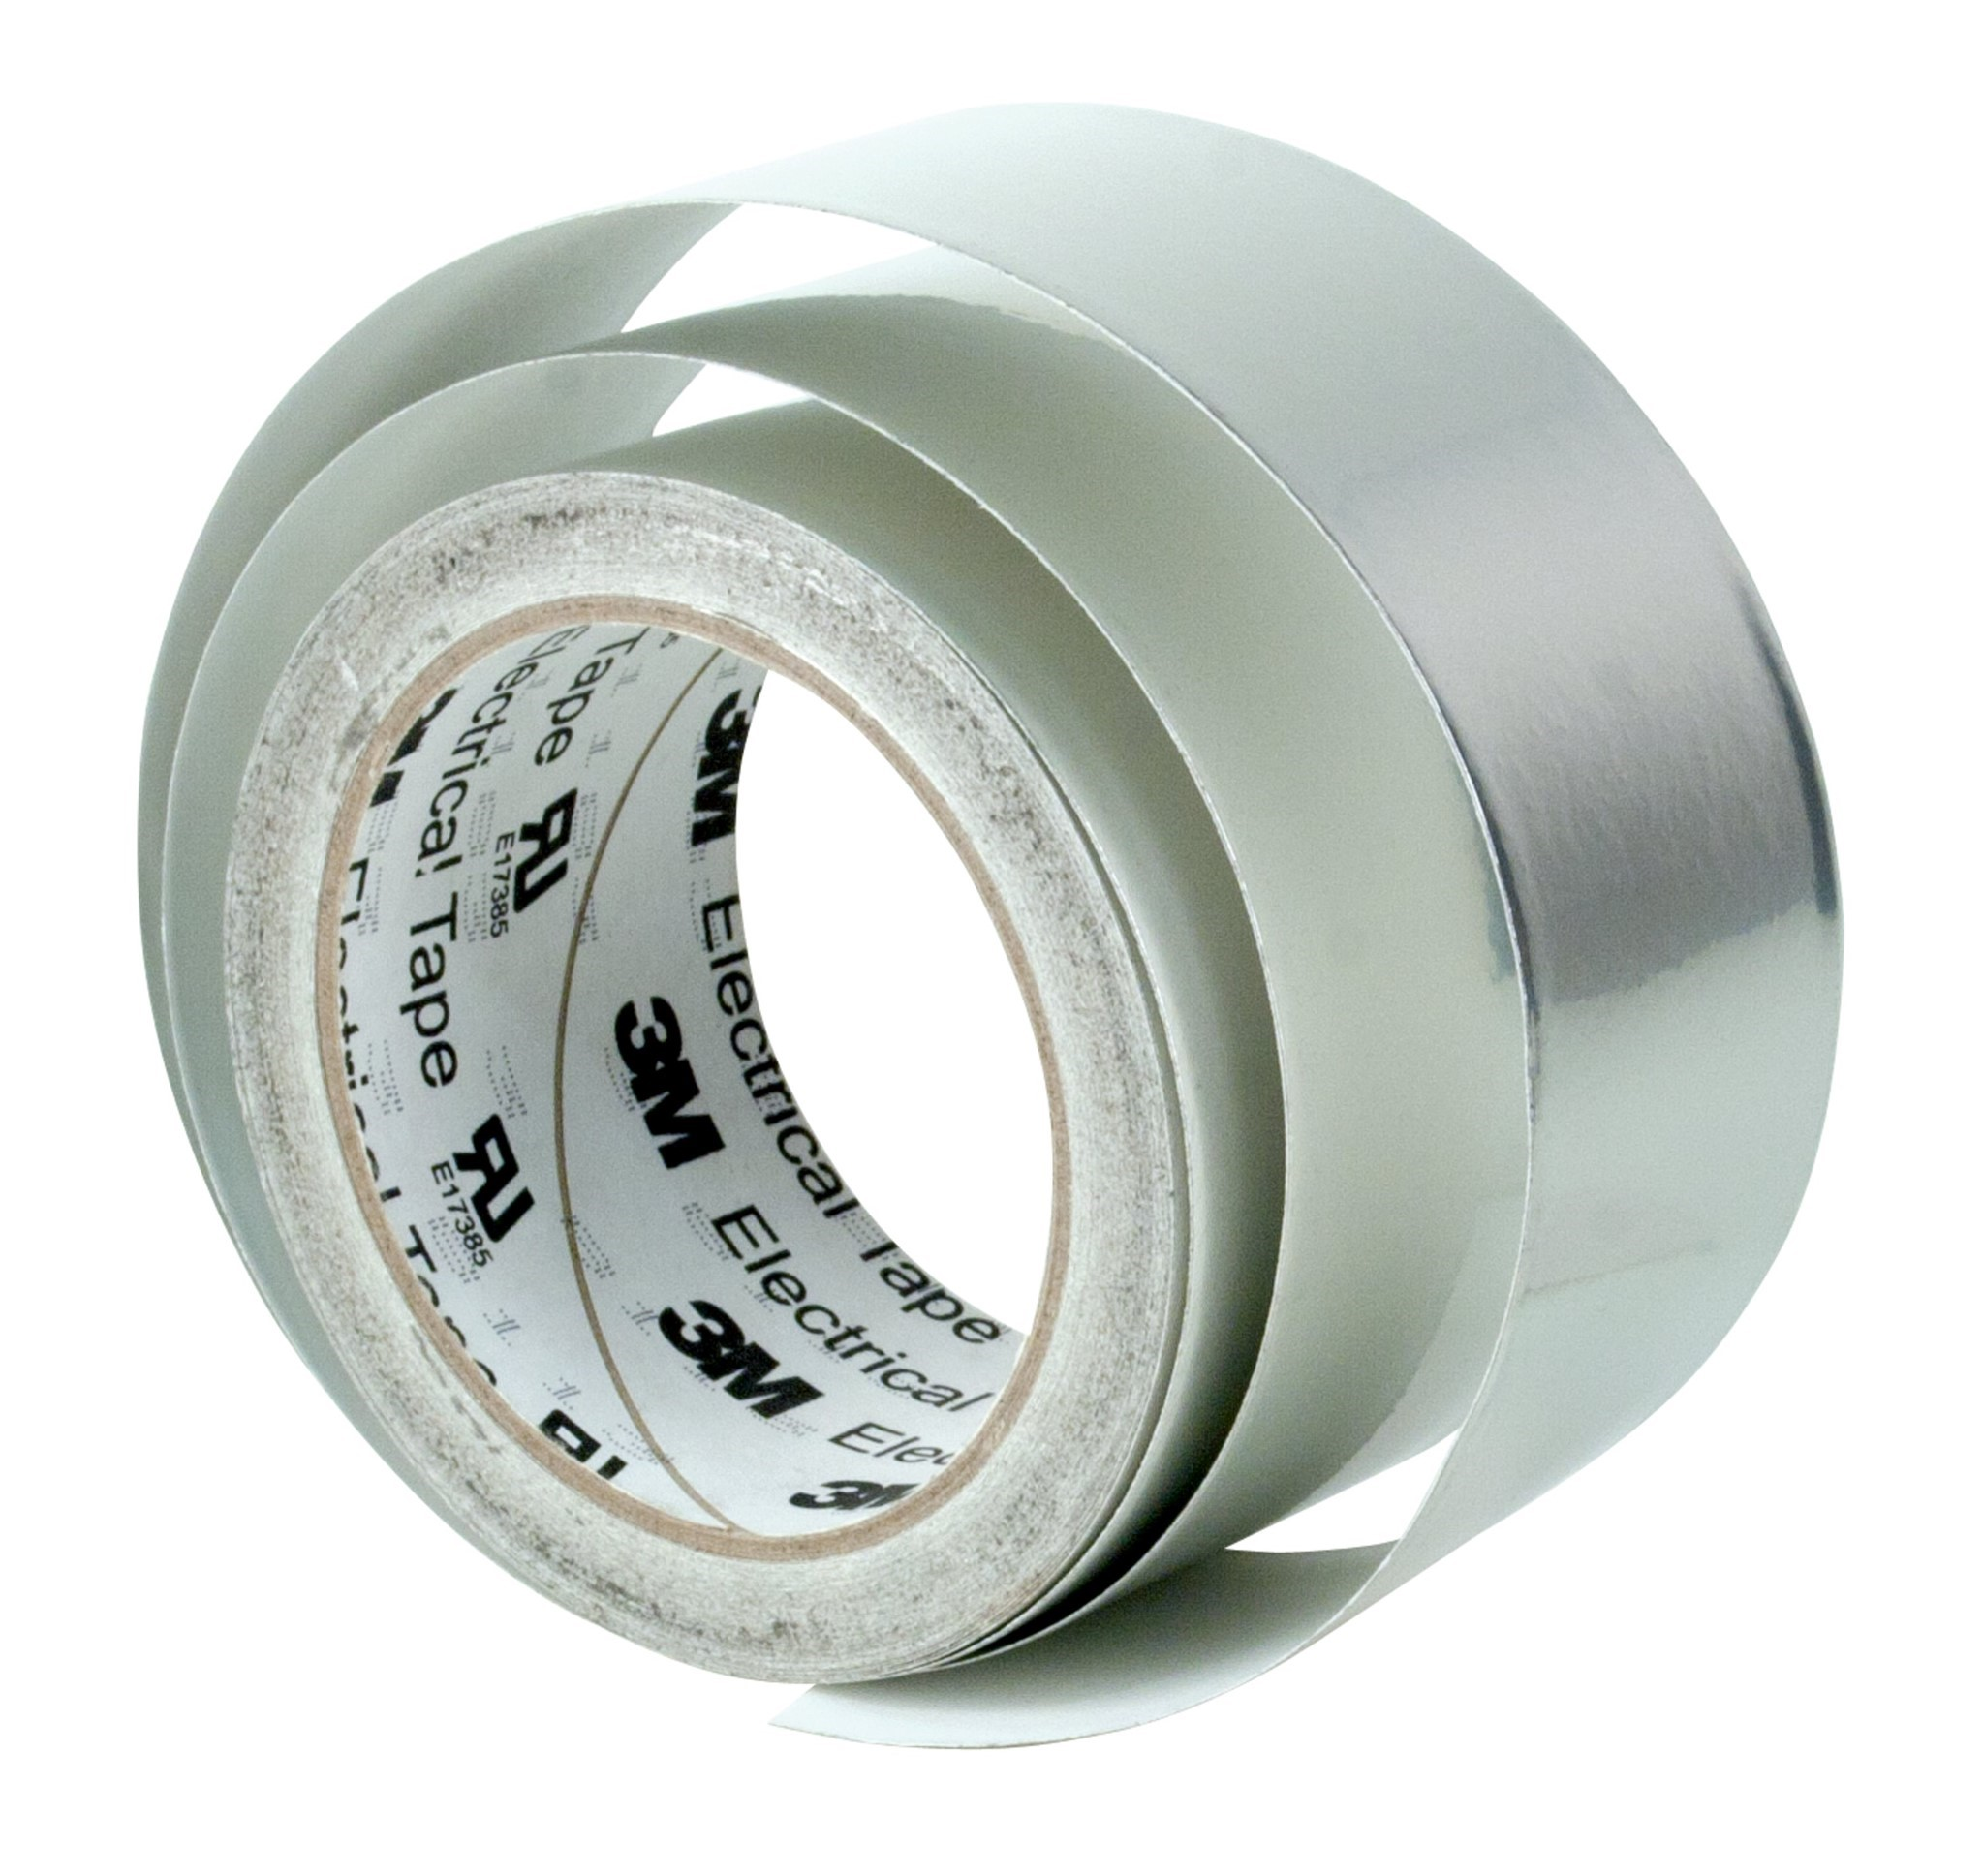 3m-1183-kupfer-klebeband-verzinnt-leitfahig